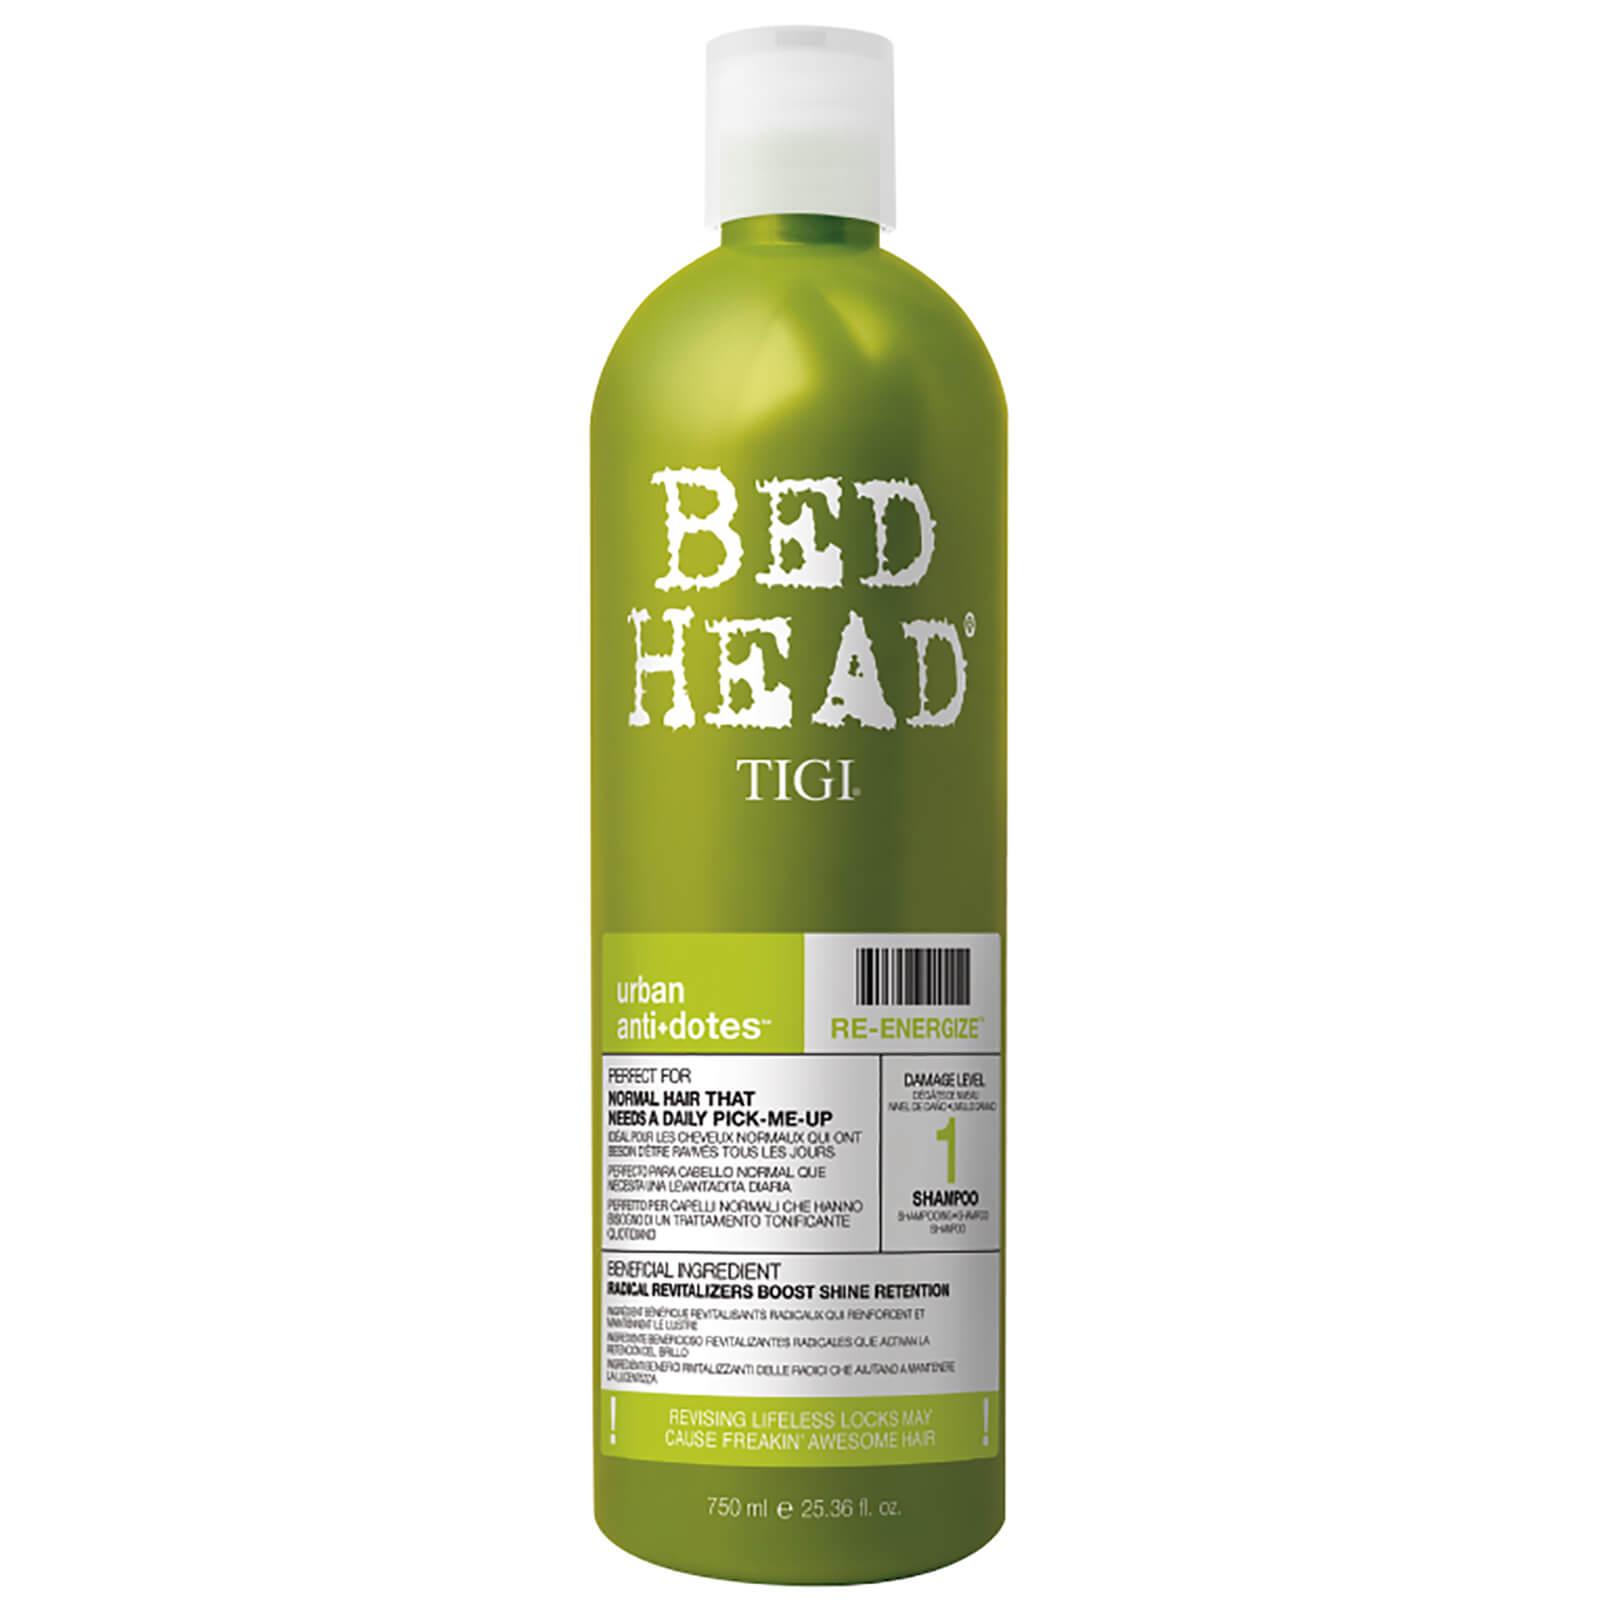 TIGI Shampooing quotidien pour cheveux normaux Urban Antidotes Re-energize TIGI Bed Head 750ml